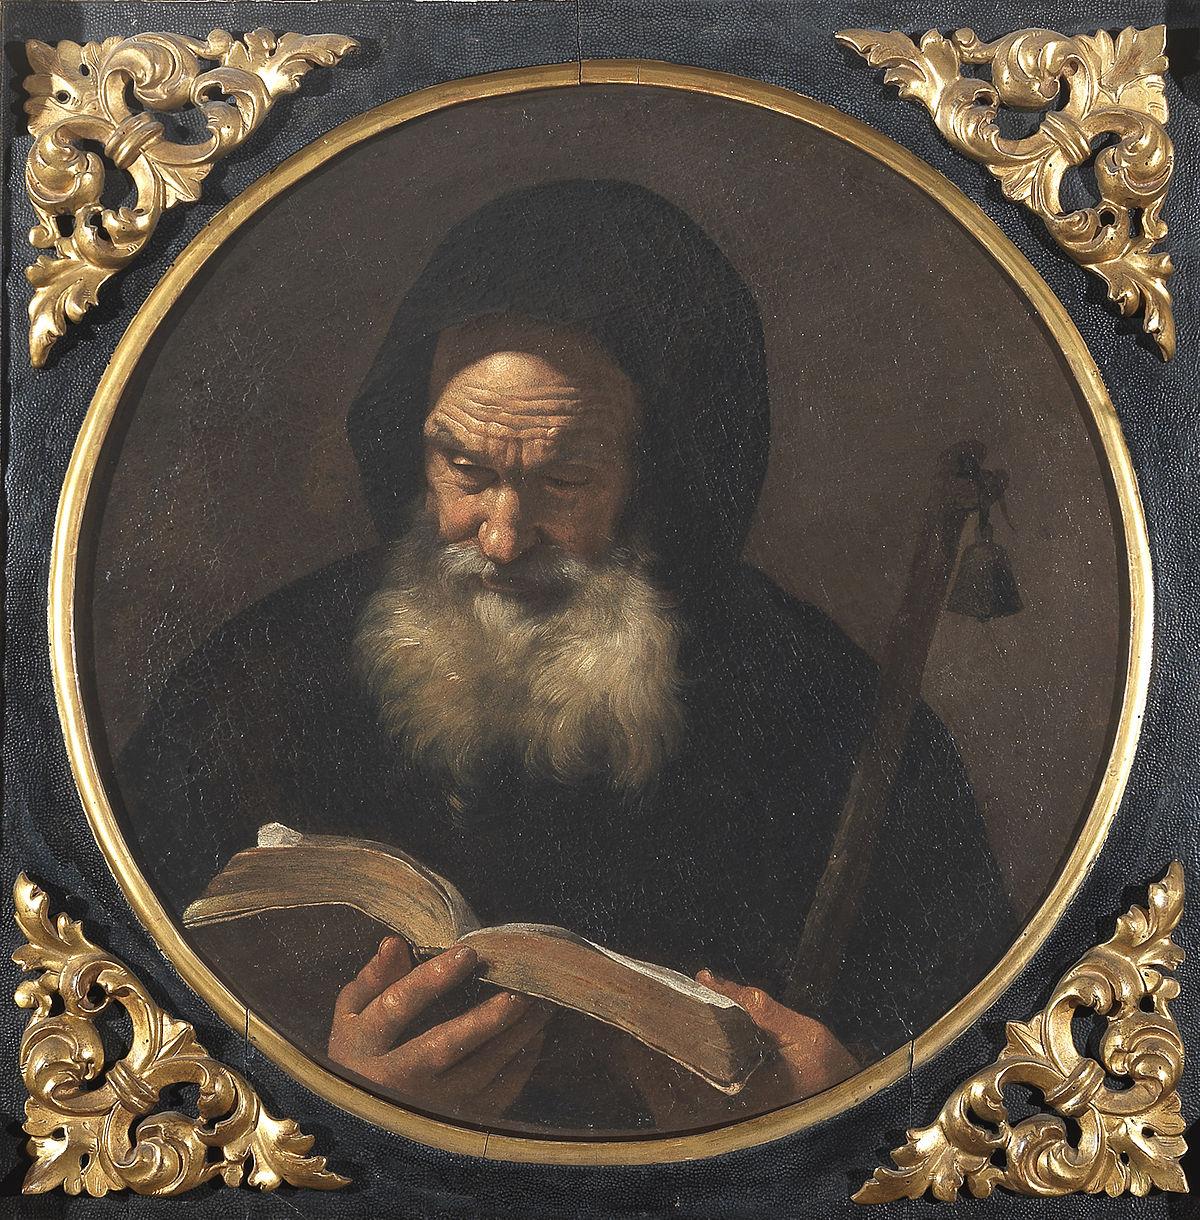 Sant 39 antonio abate mattia preti wikipedia for Arredo bimbo sant antonio abate